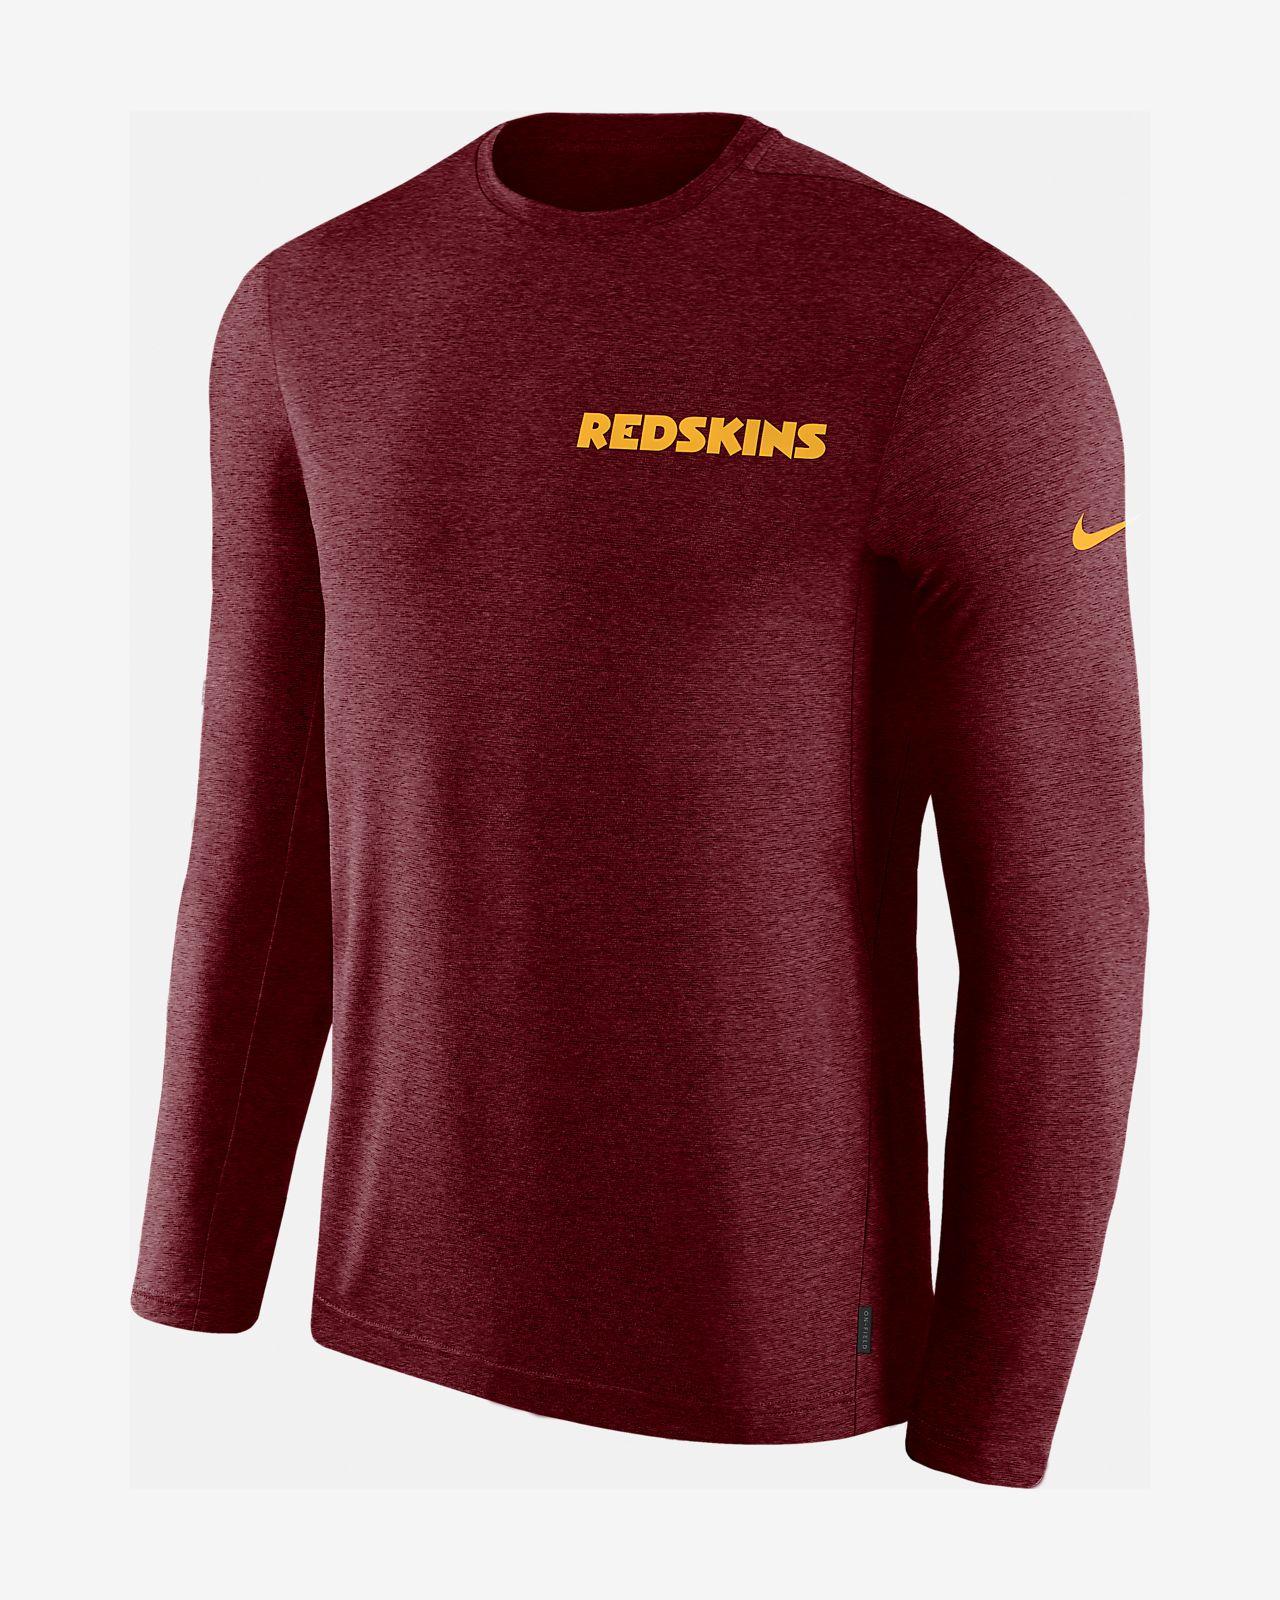 4a11a6504a1399 Nike Dri-FIT Coach (NFL Redskins) Men s Long-Sleeve Top. Nike.com